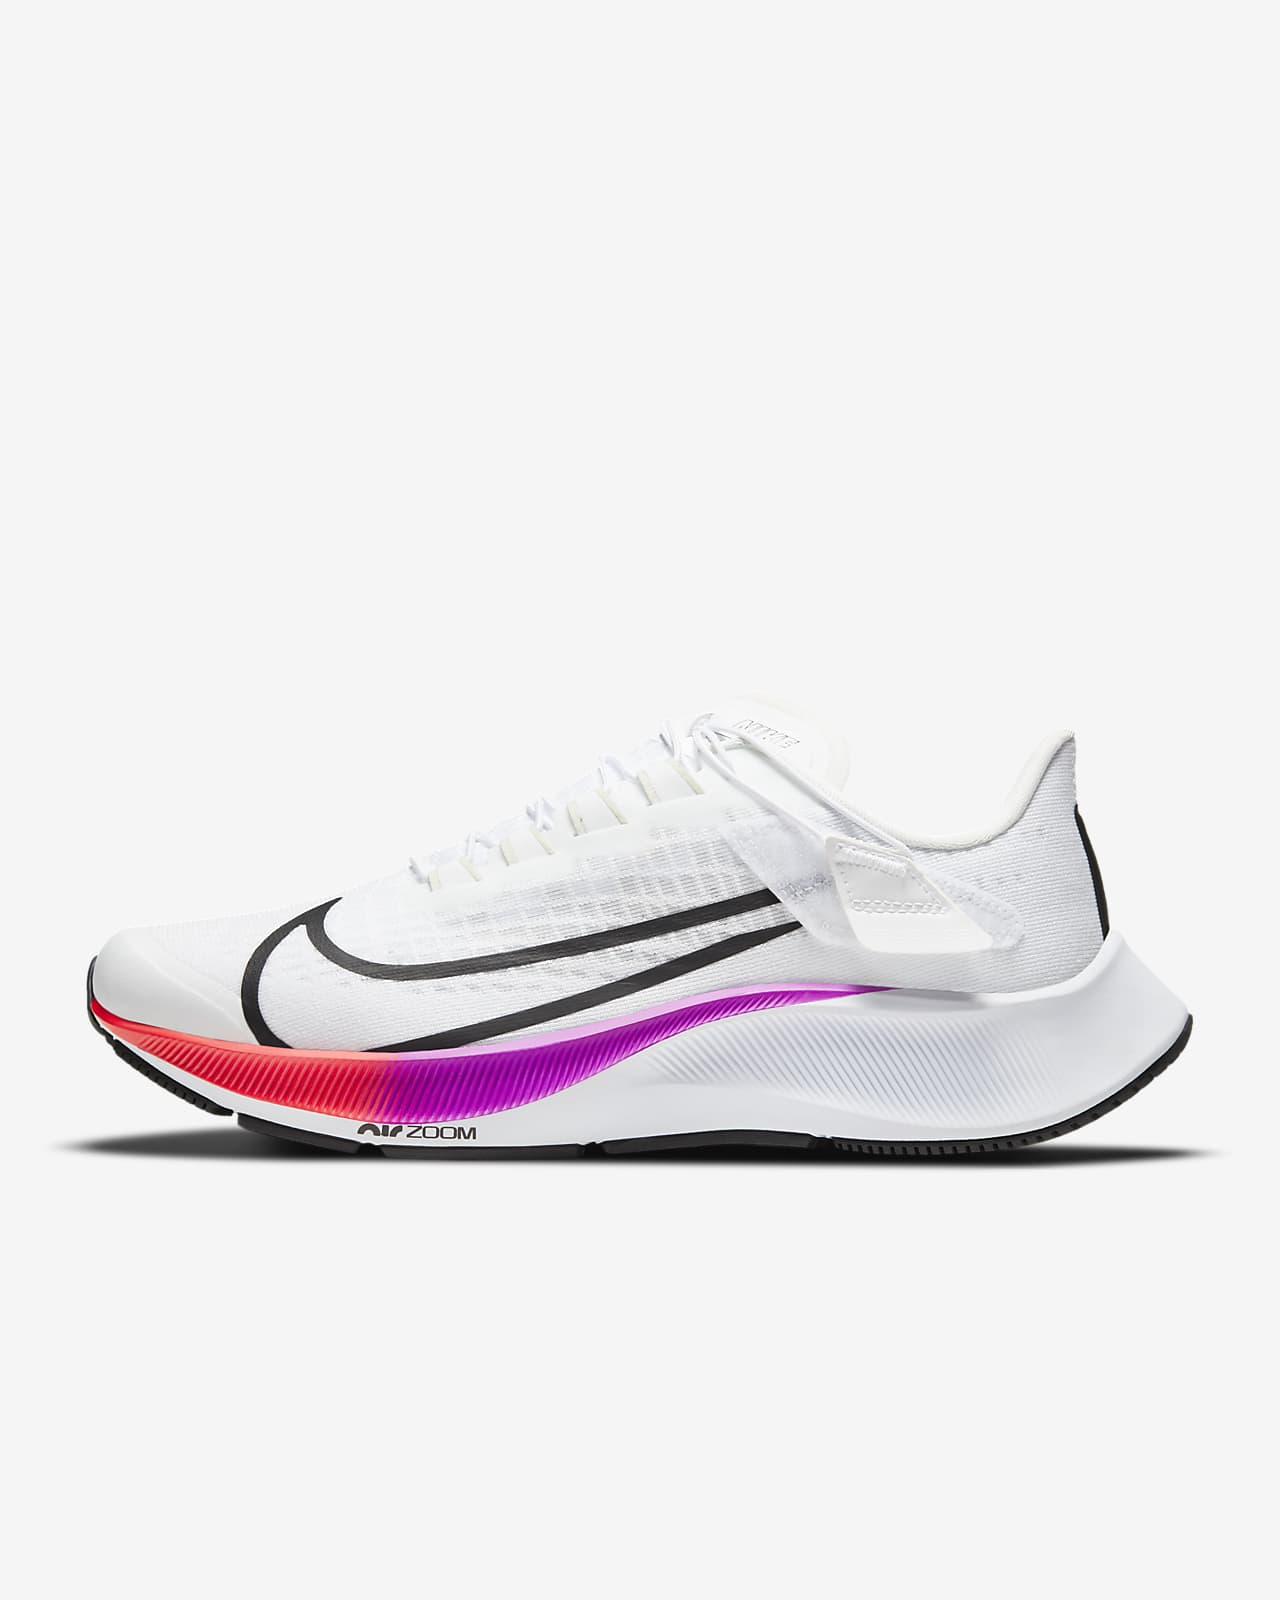 Sapatilhas de running Nike Air Zoom Pegasus 37 FlyEase para mulher